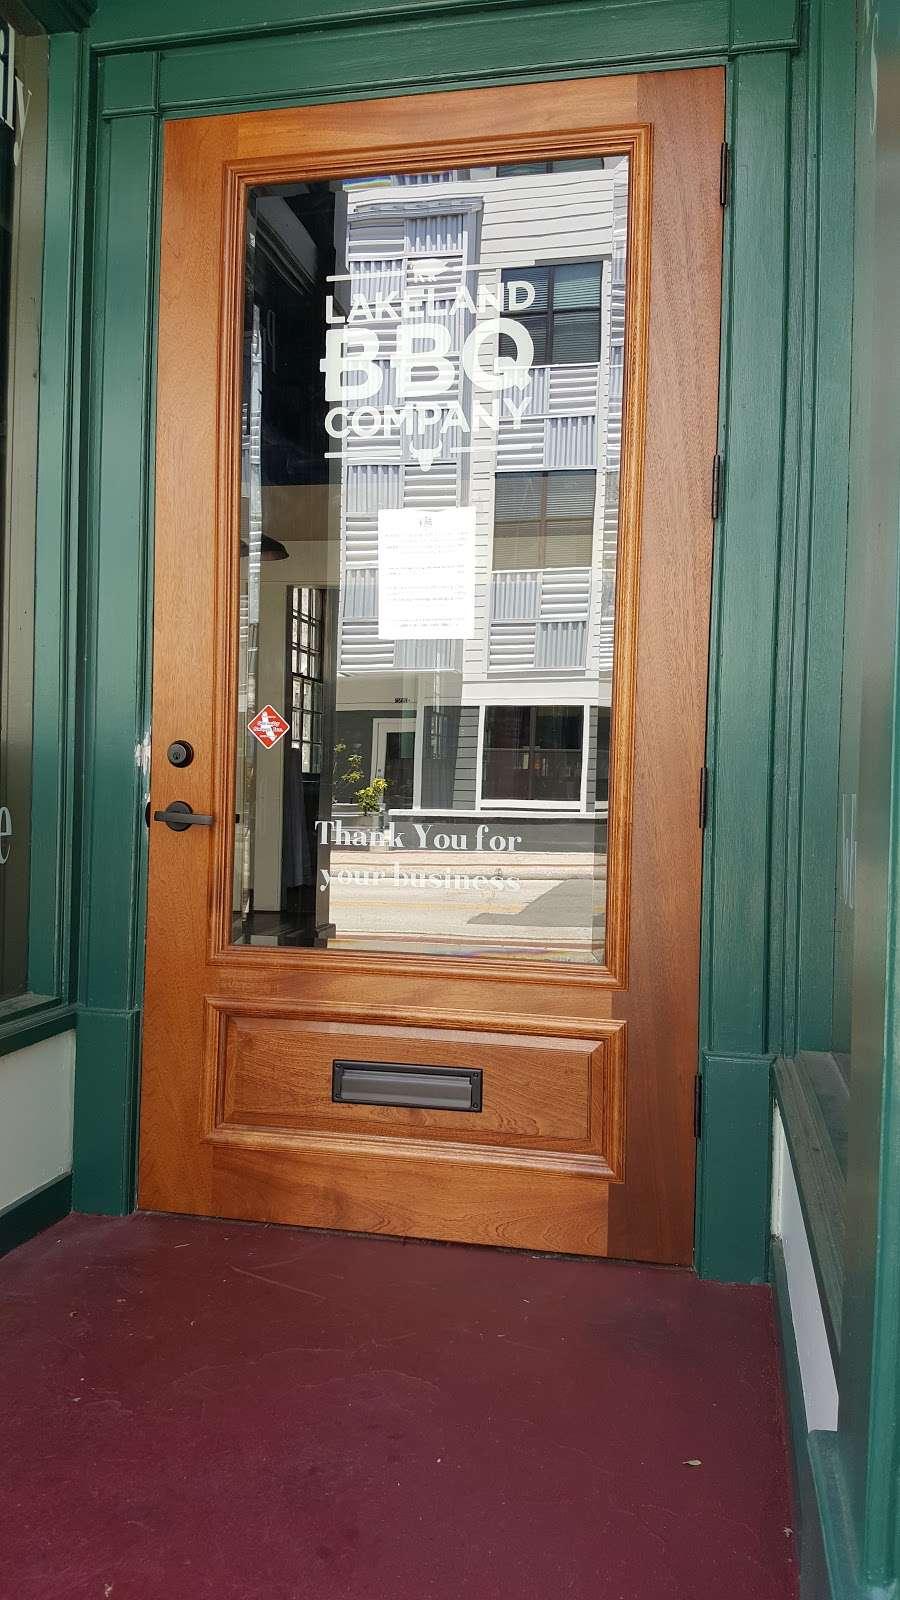 Hardwood Lumber & Millwork - store  | Photo 1 of 10 | Address: 4316 Wallace Rd, Lakeland, FL 33812, USA | Phone: (863) 646-8681